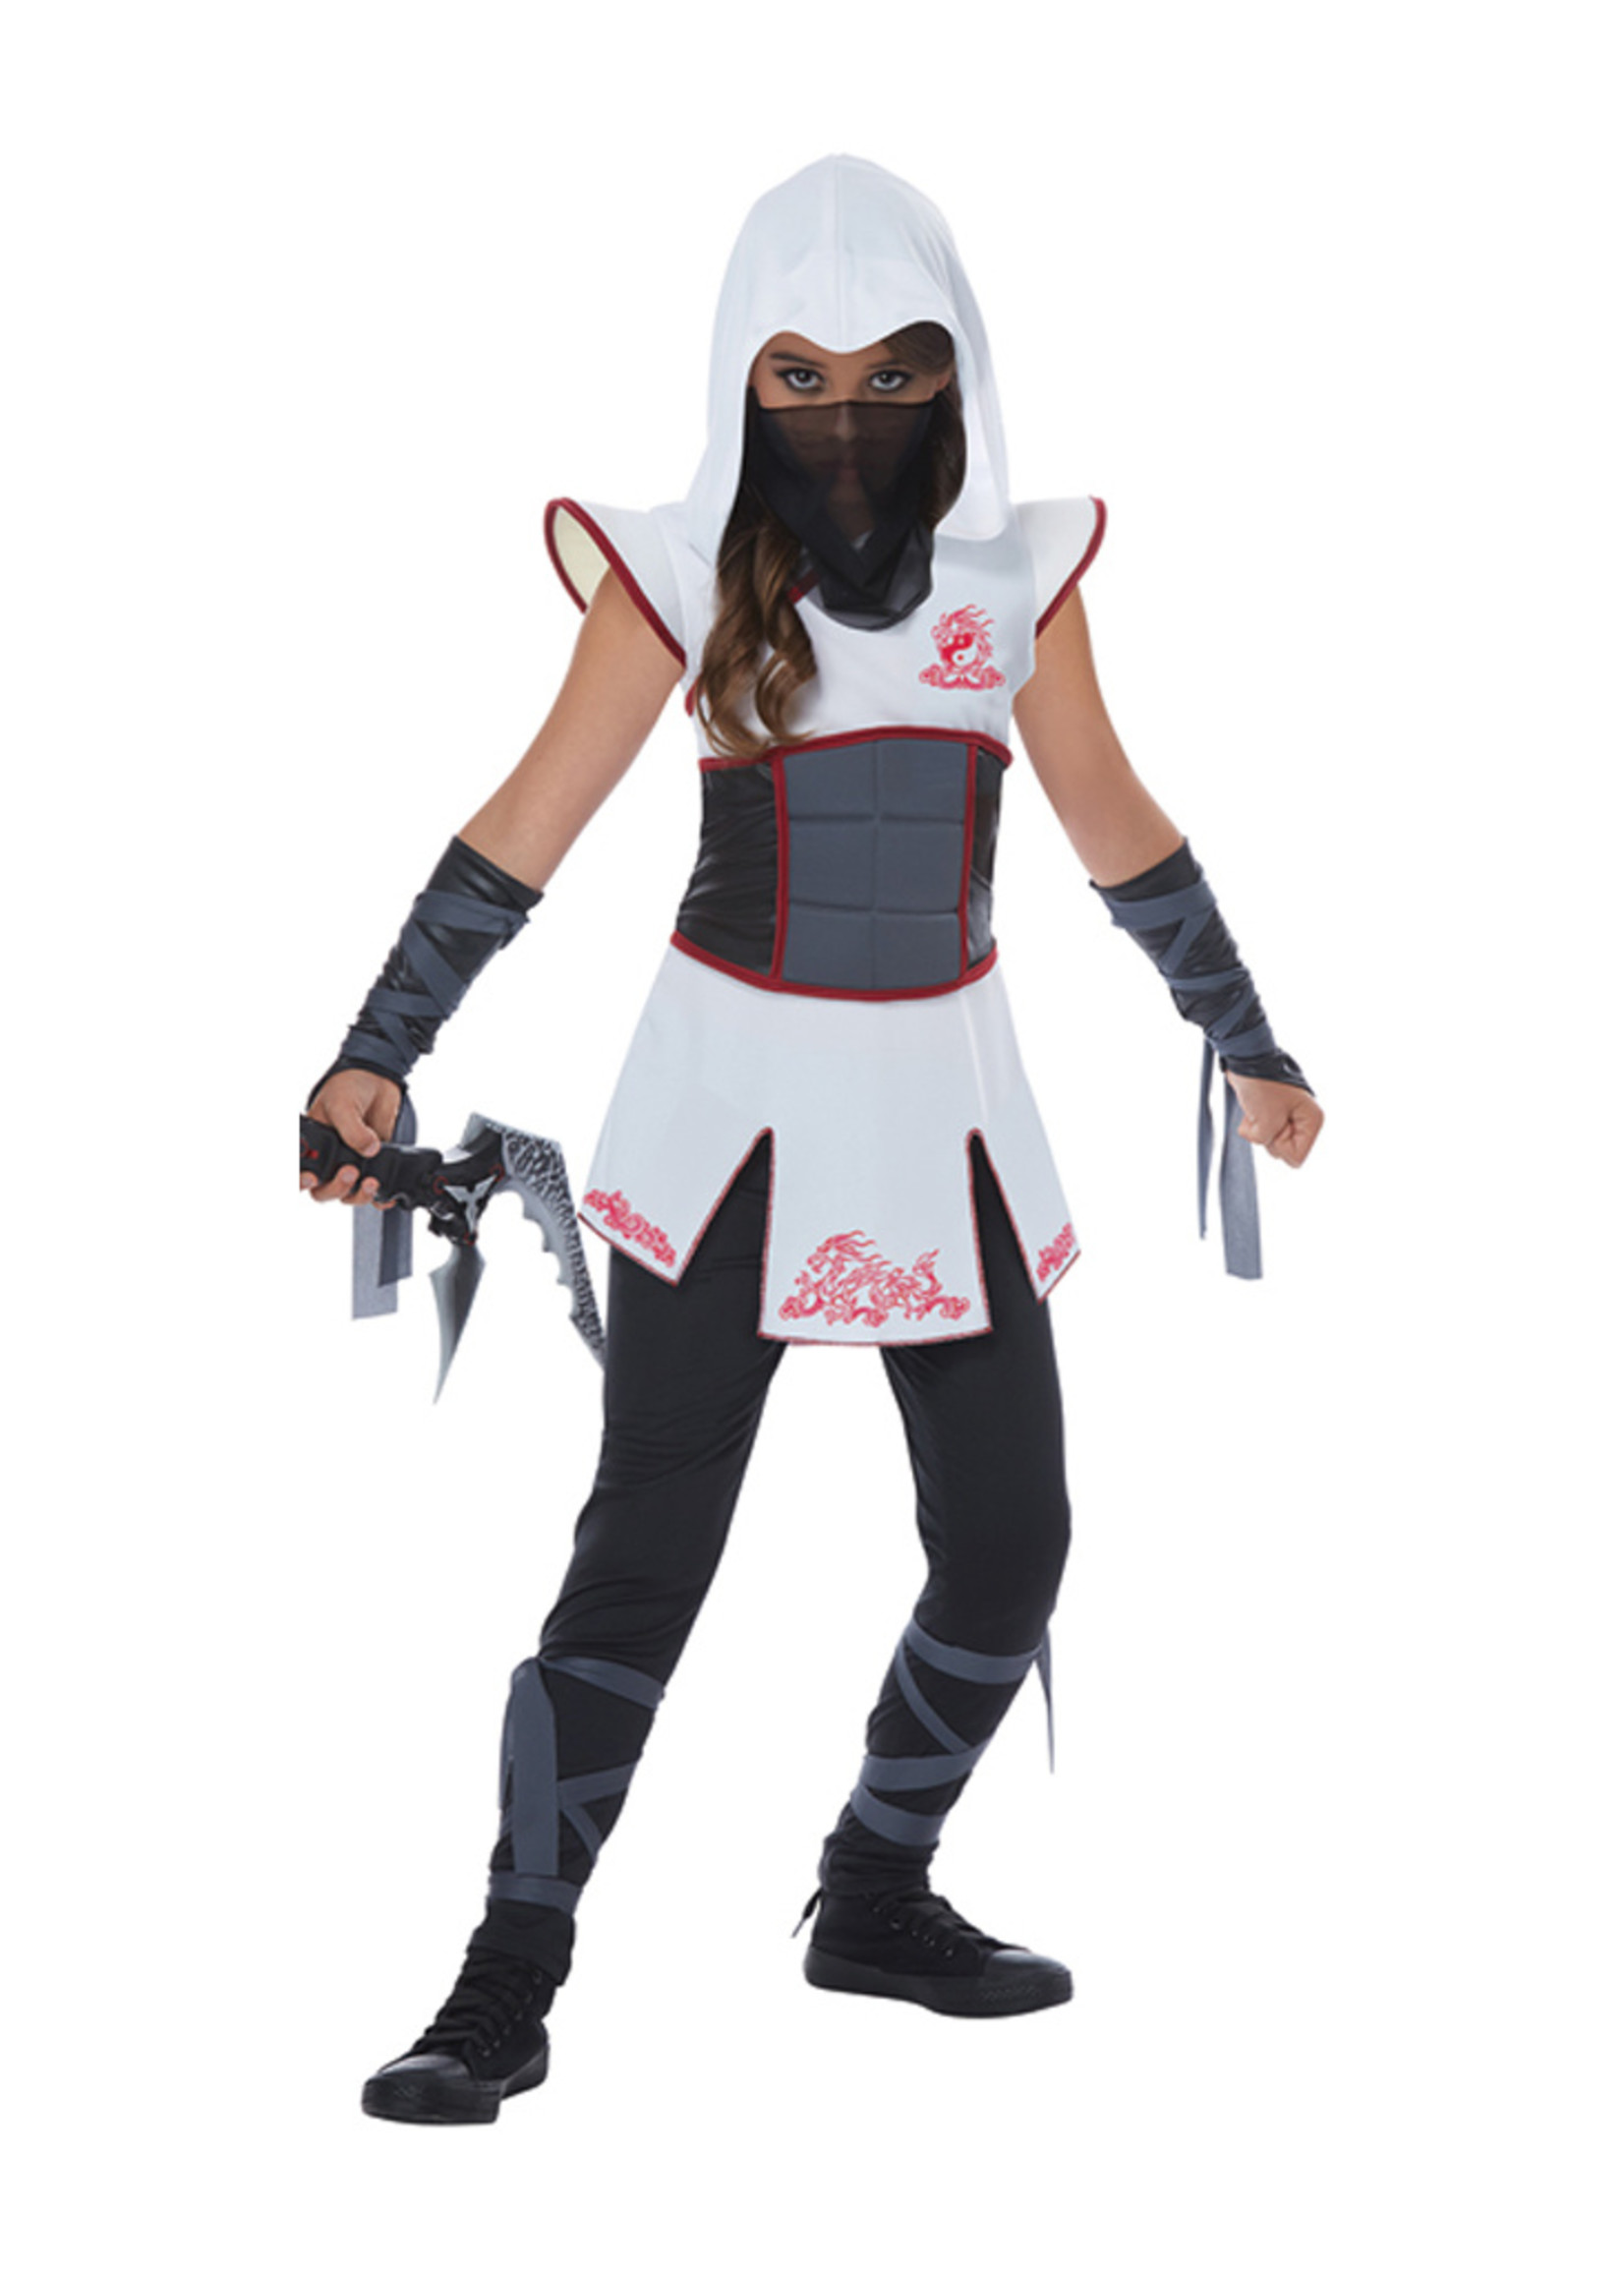 Fearless Ninja Costume - Girls